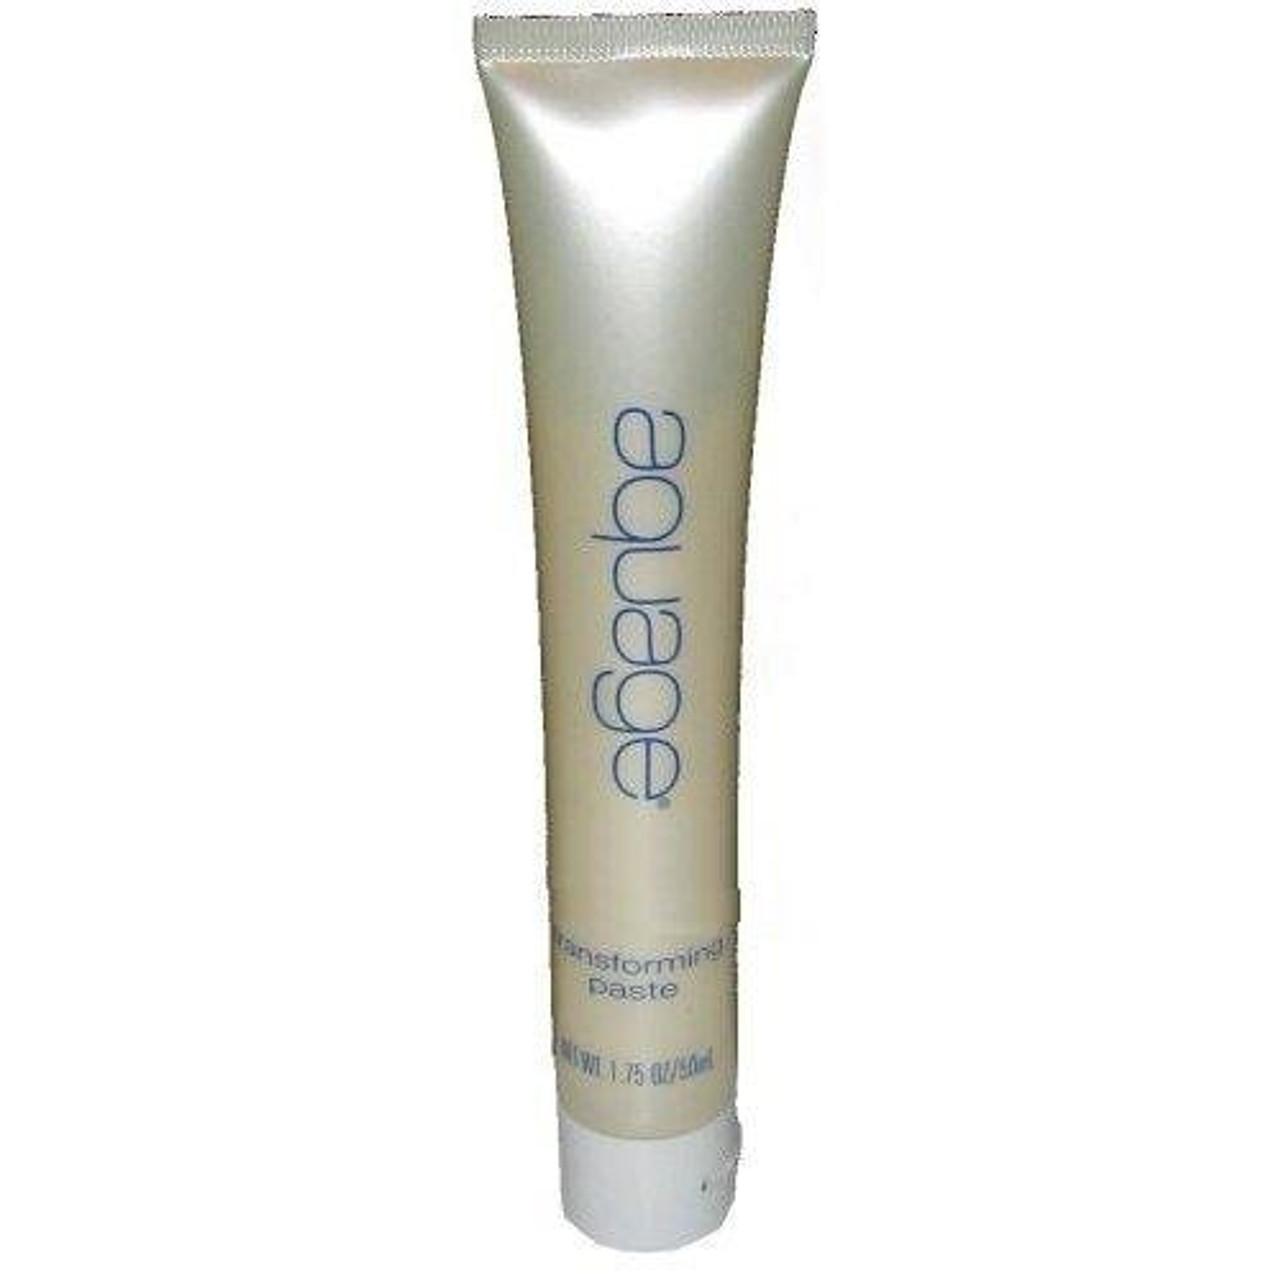 Aquage Transforming Paste 1.75 oz